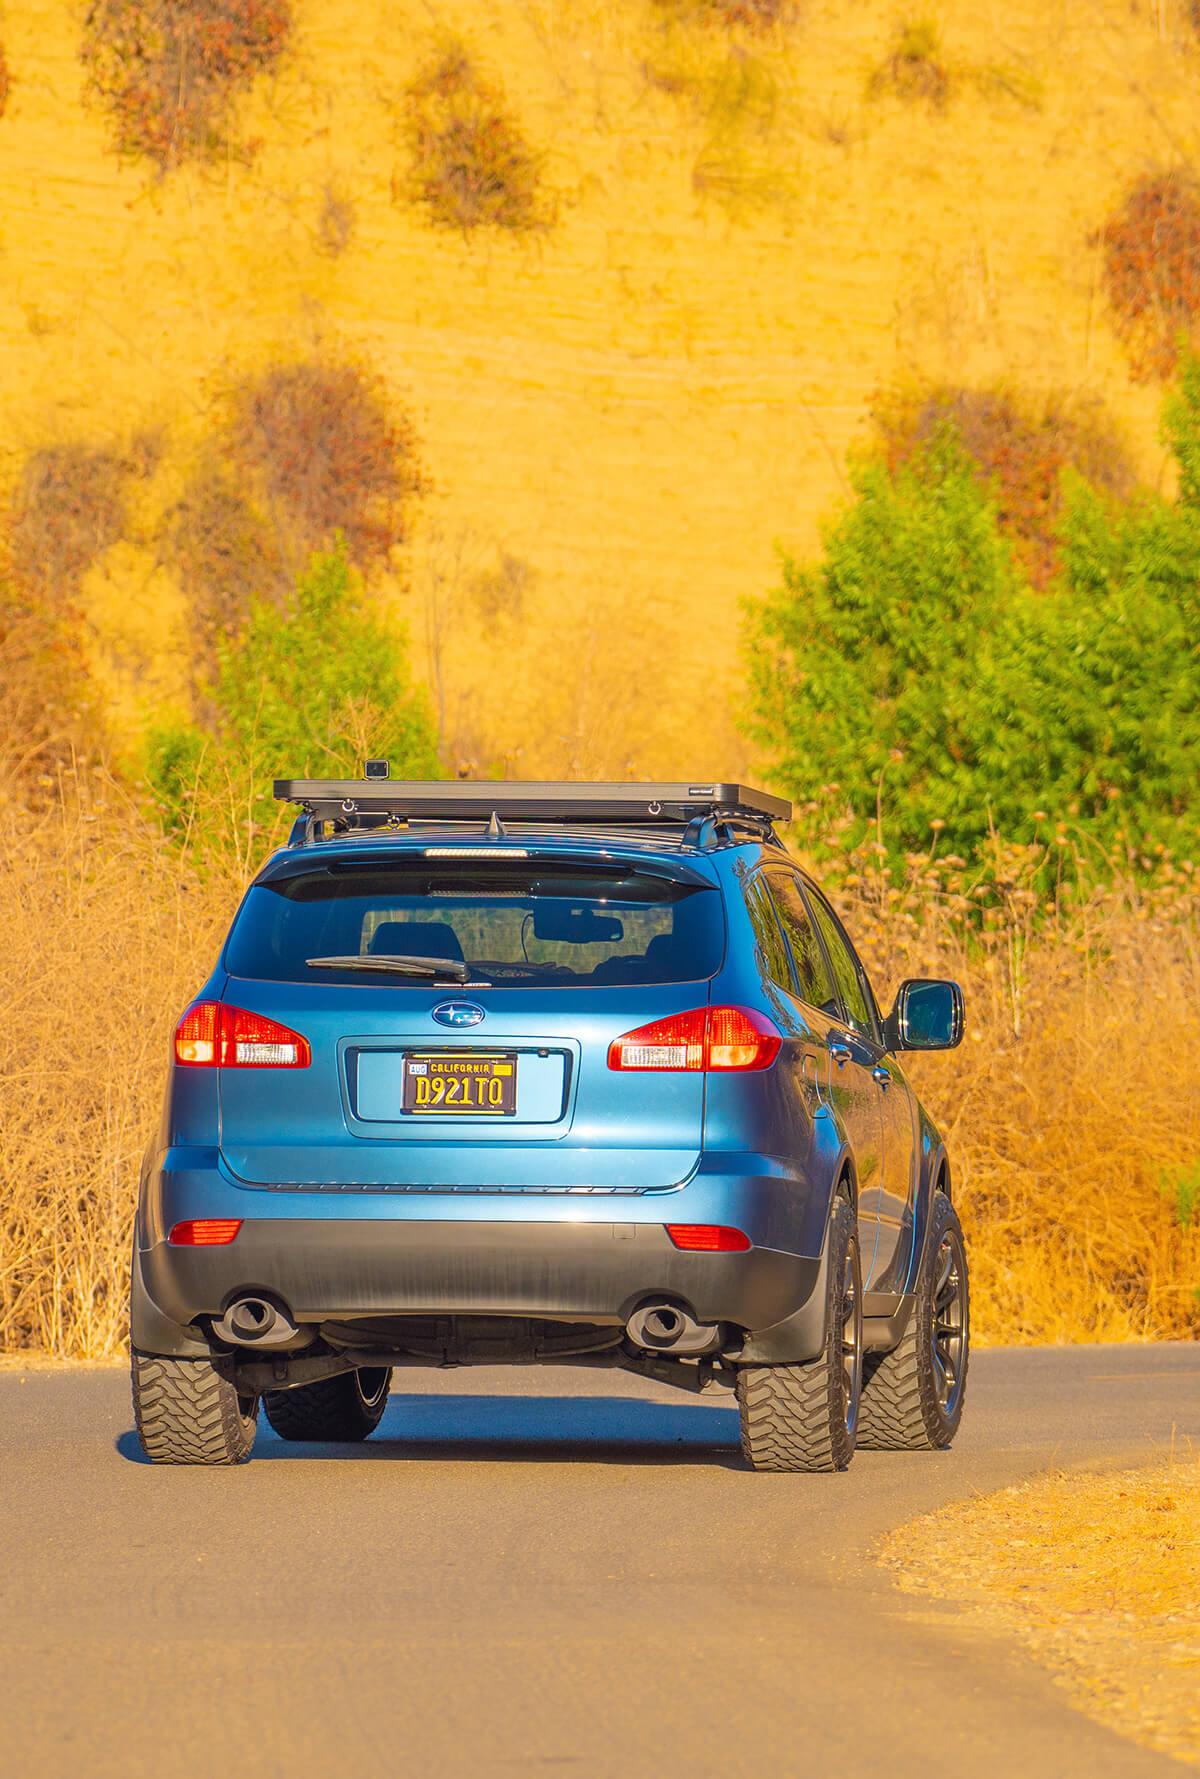 Subaru Tribeca with a roof rack